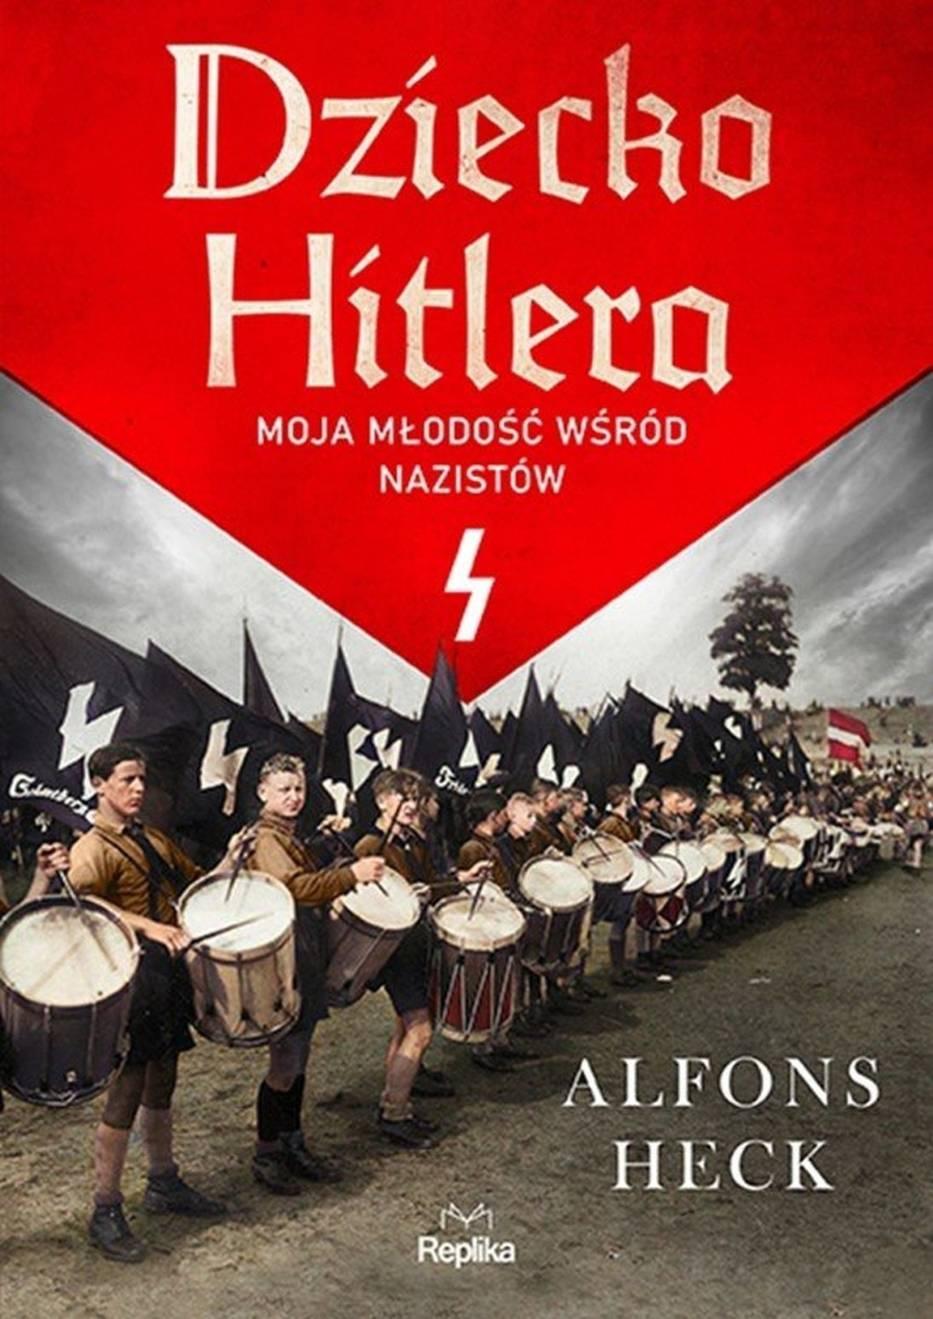 Alfons Heck – Dziecko Hitlera